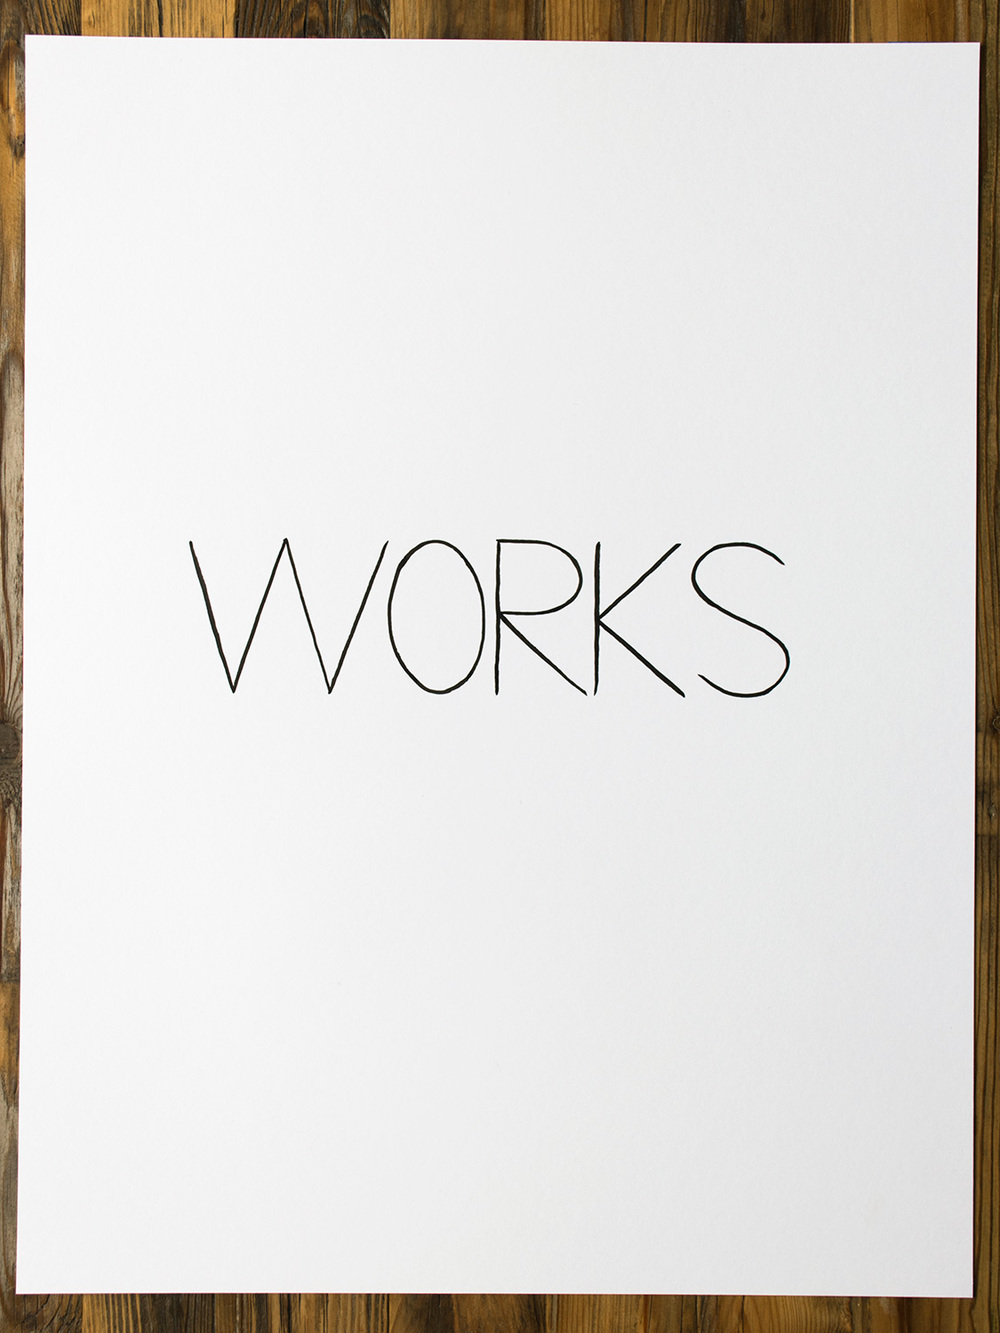 works-1500x1125.jpg